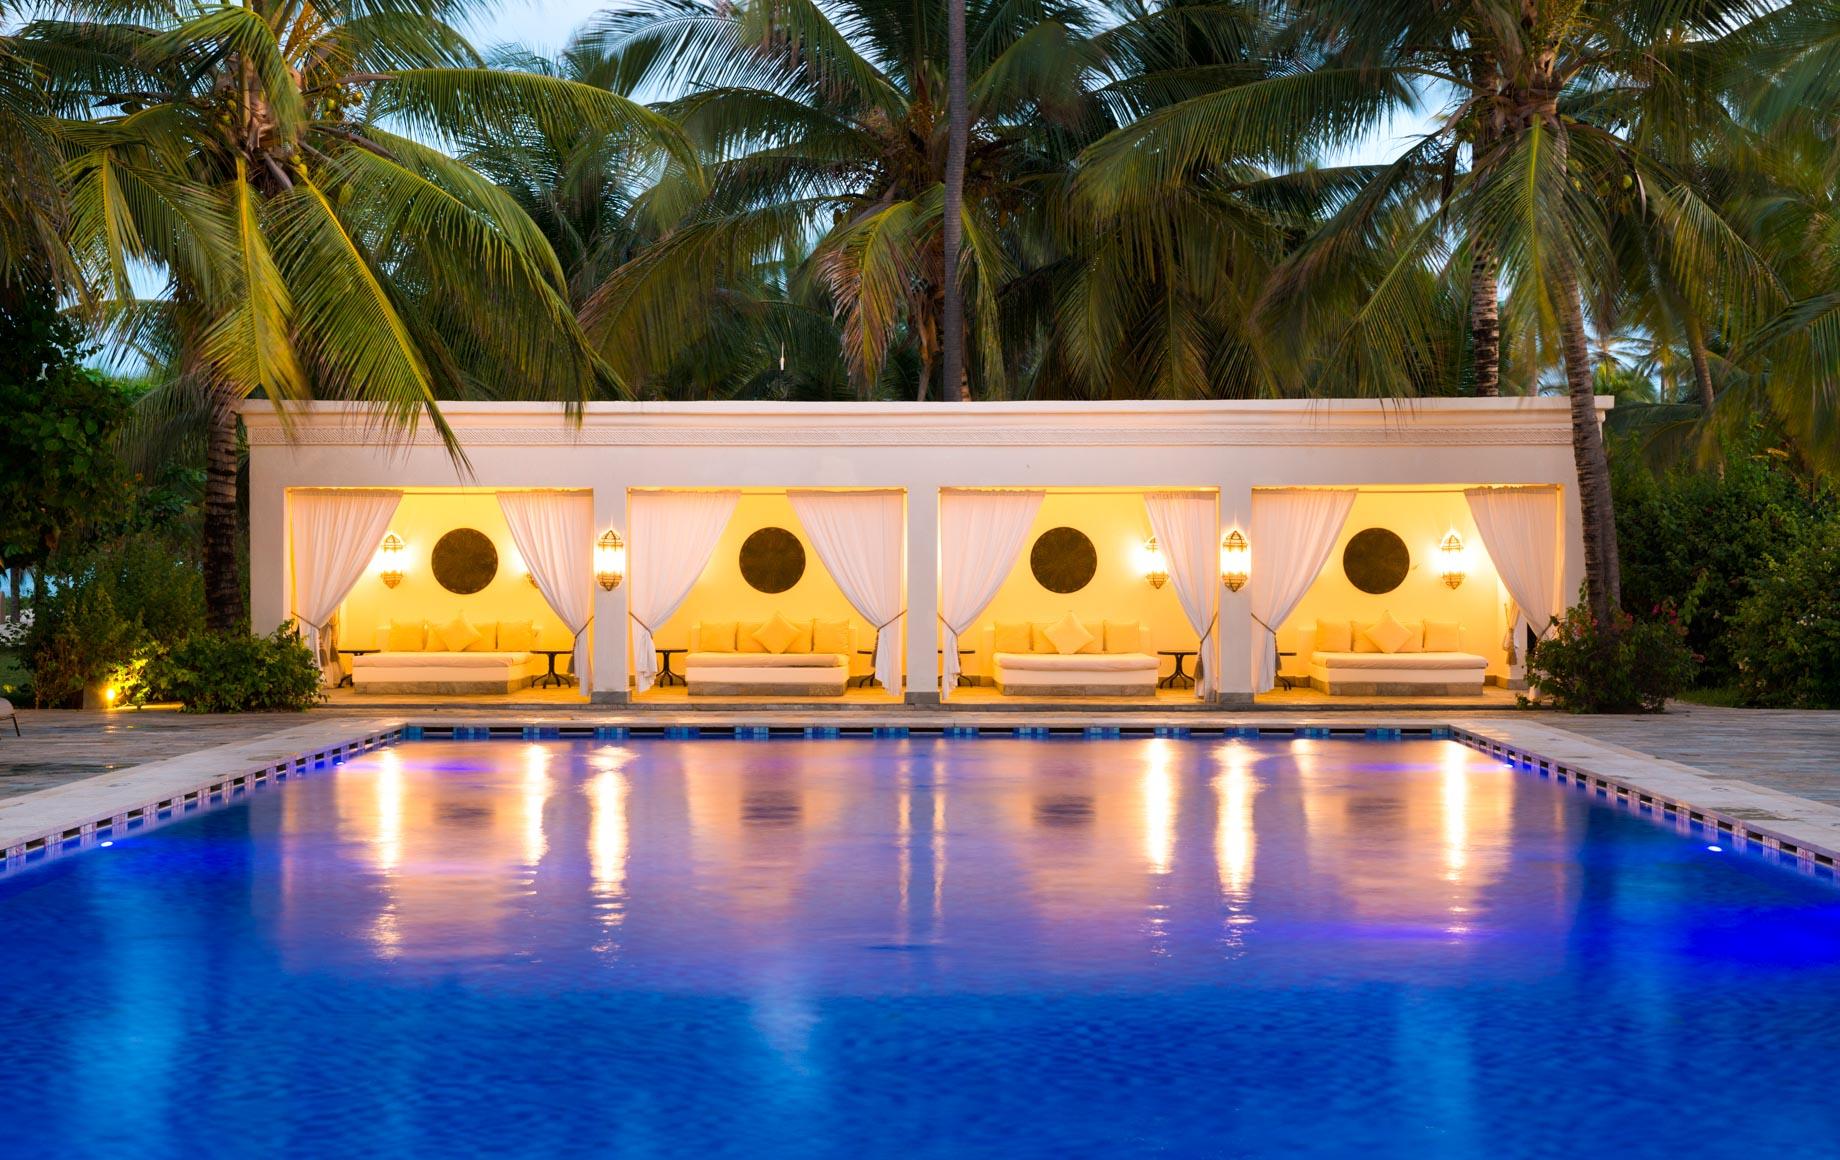 Outdoor pool of Baraza Resort & Spa at dusk